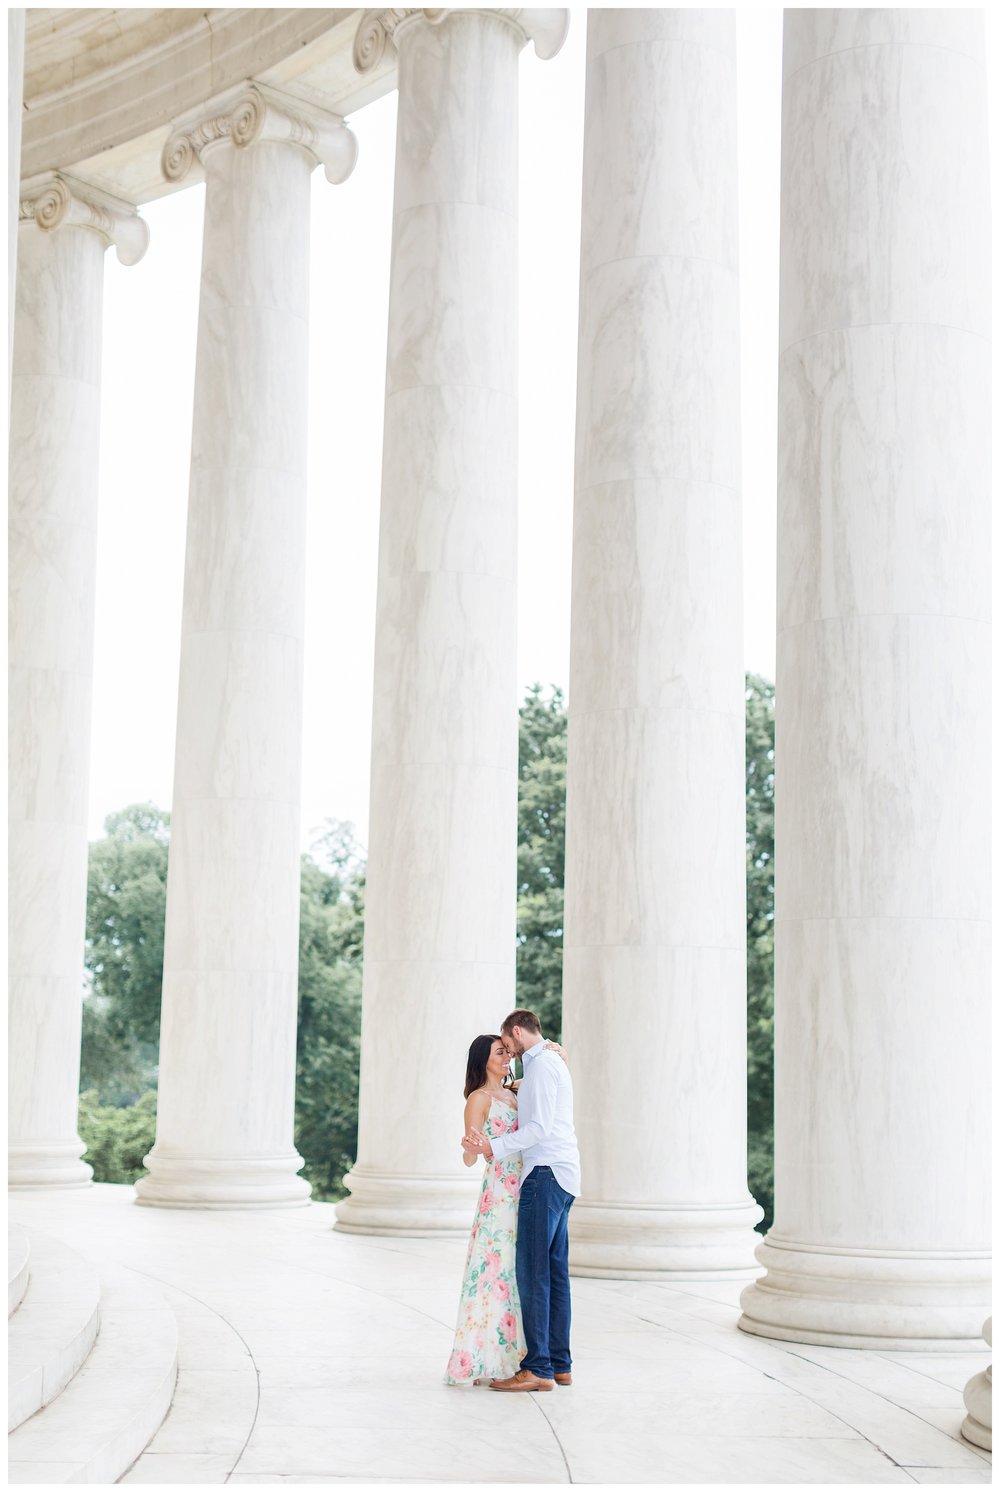 Washington DC Engagement Photos District of Columbia Wedding Photographer_0042.jpg